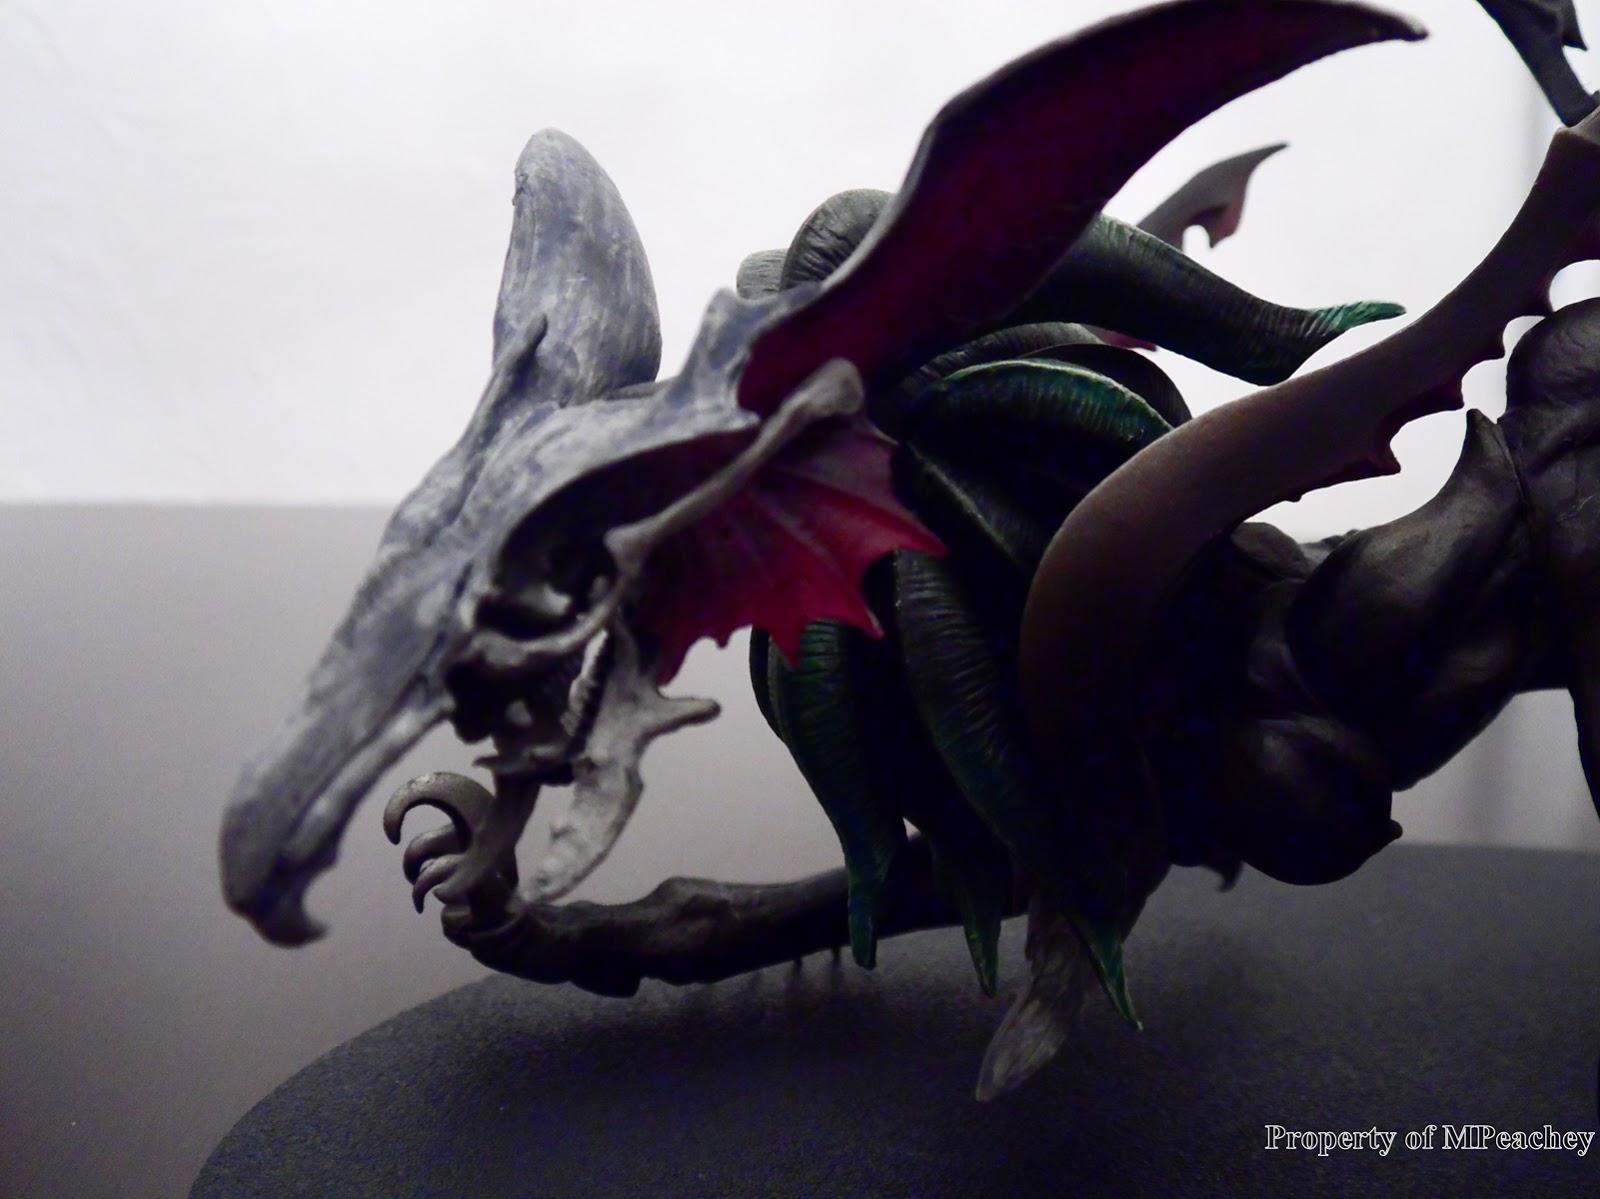 PeachUK: Final Fantasy VII